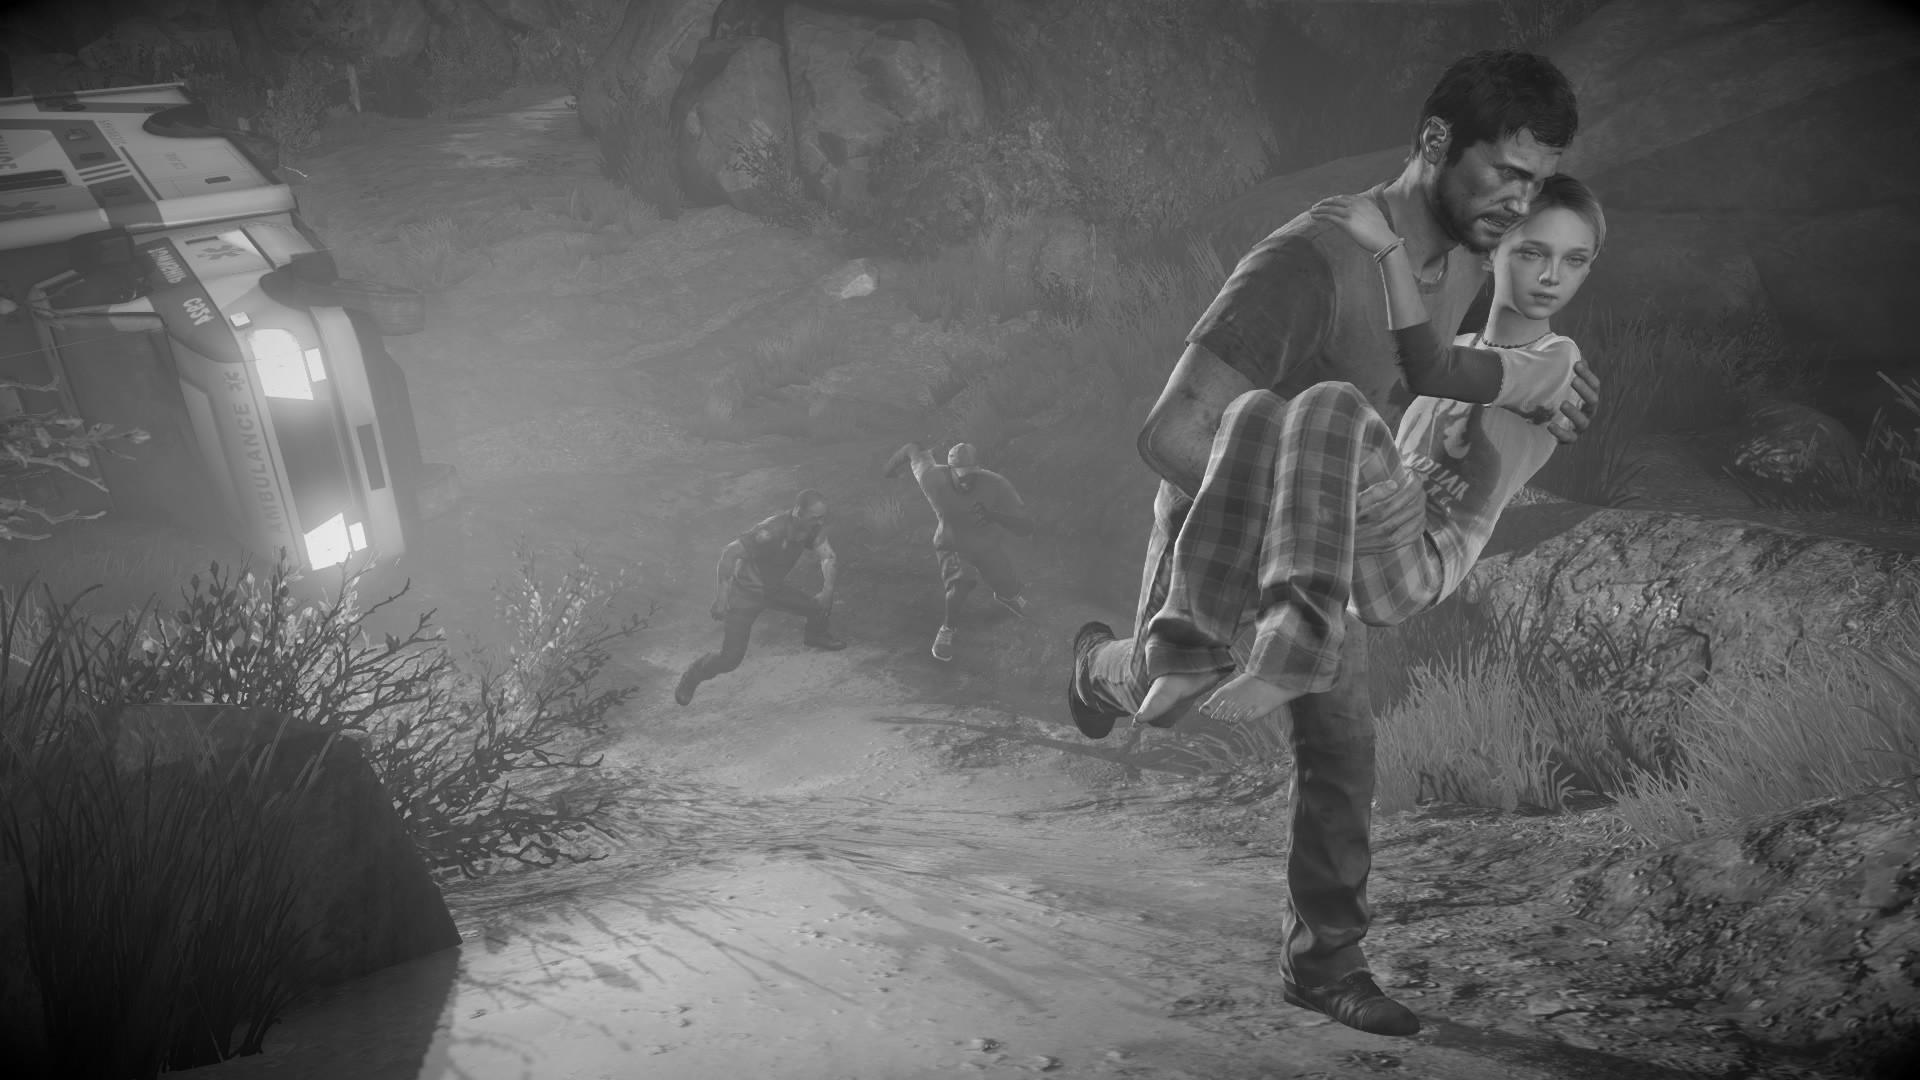 The Last Of Us Wallpaper 624596 - Last Of Us Wallpaper Black , HD Wallpaper & Backgrounds